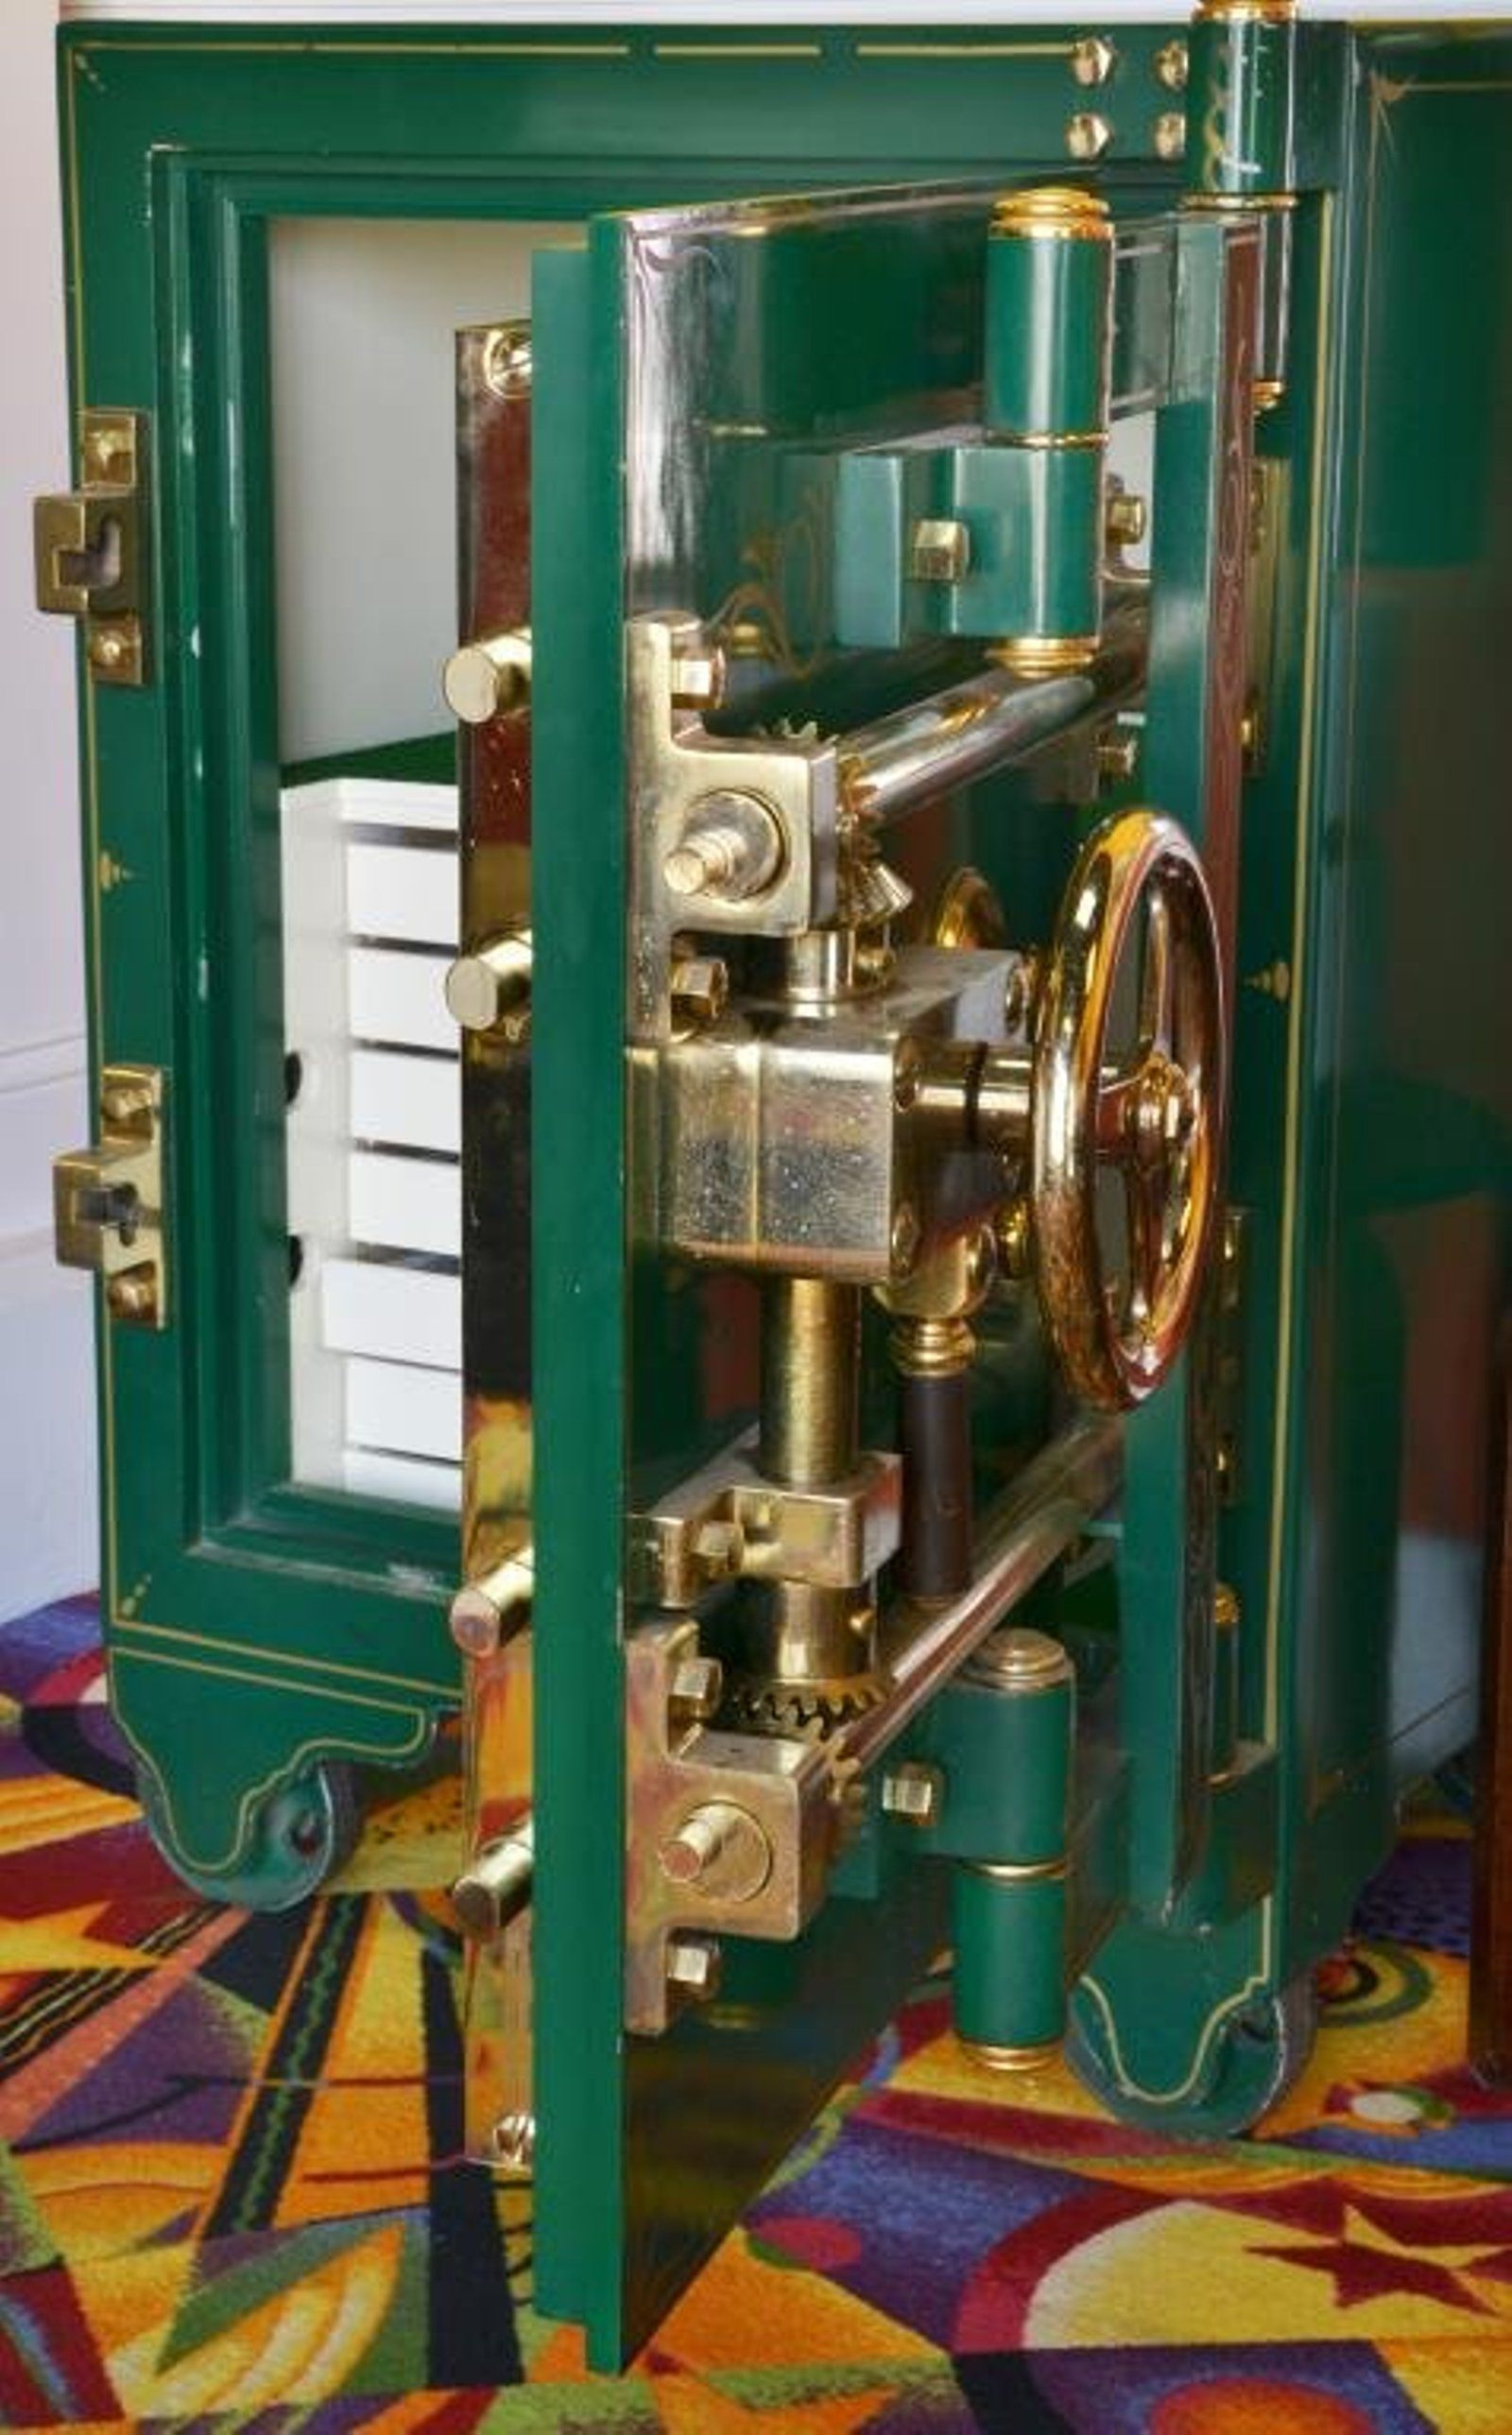 Lot An Antique Mosler Bankers Chest (Safe), Lot Number